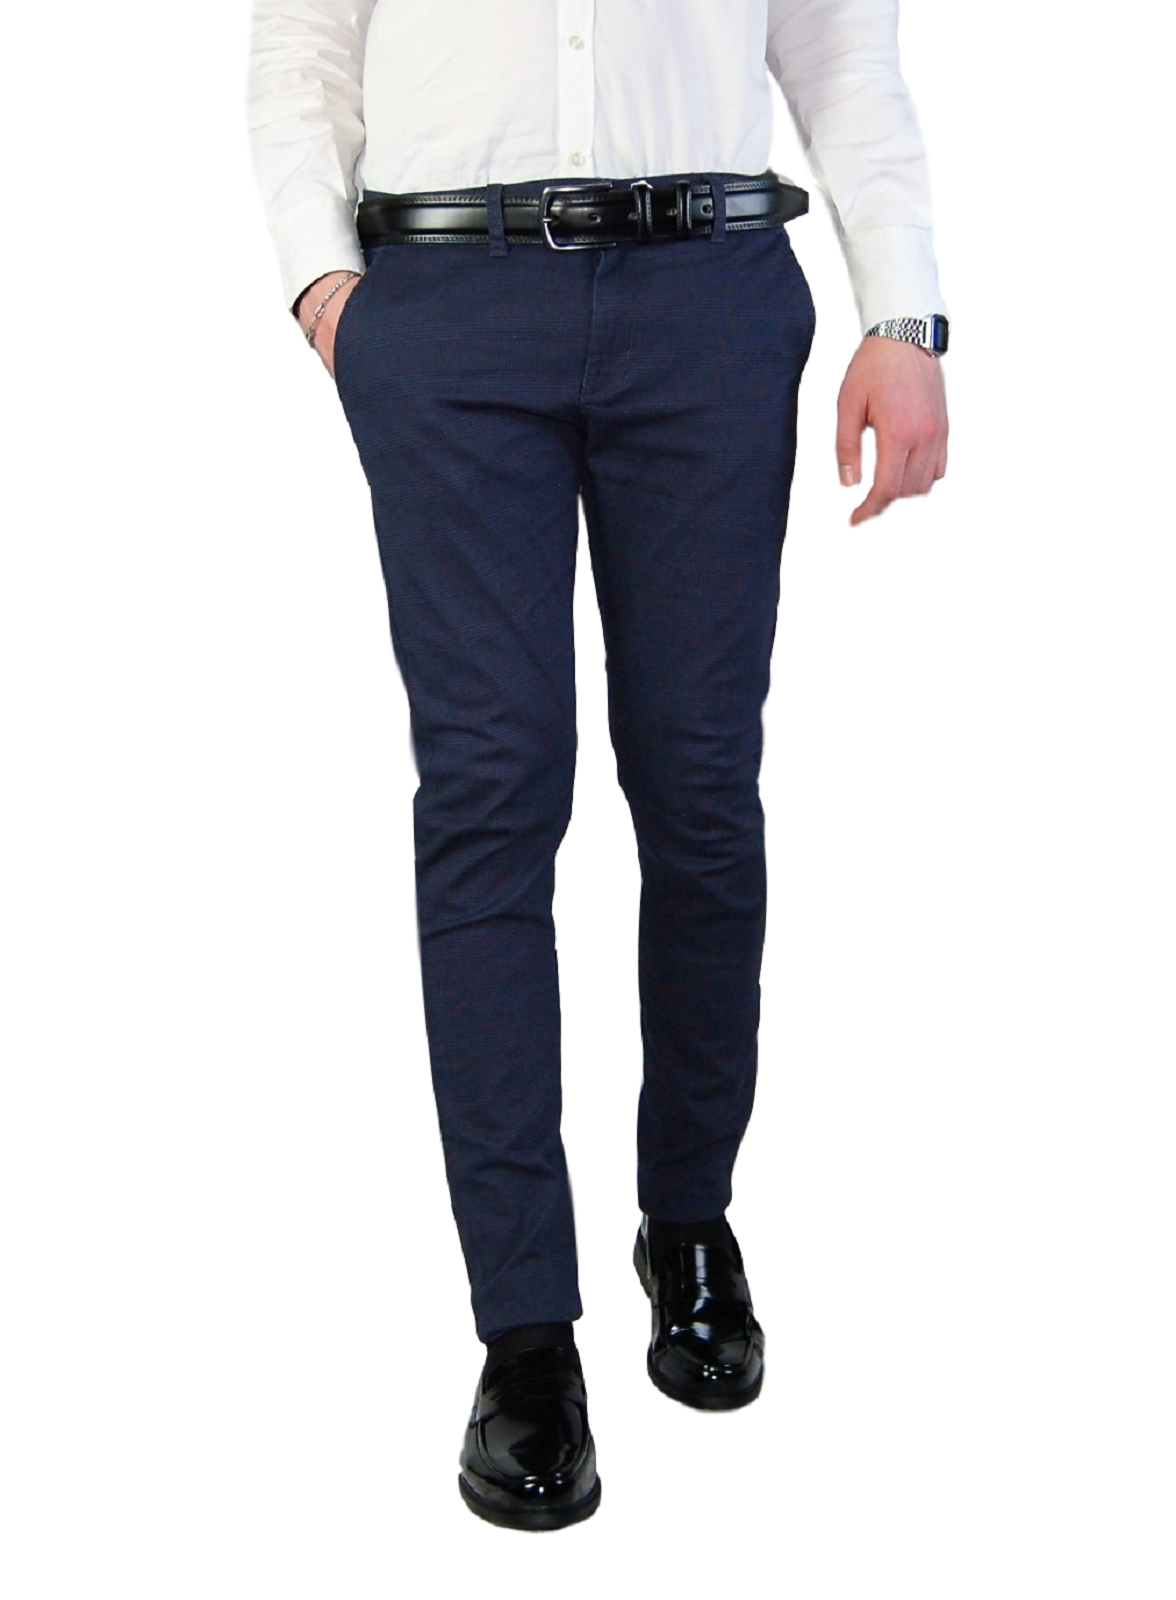 Pantalone-Uomo-Chino-Slim-Fit-Elegante-Quadri-Principe-di-Galles-Invernale miniatura 11